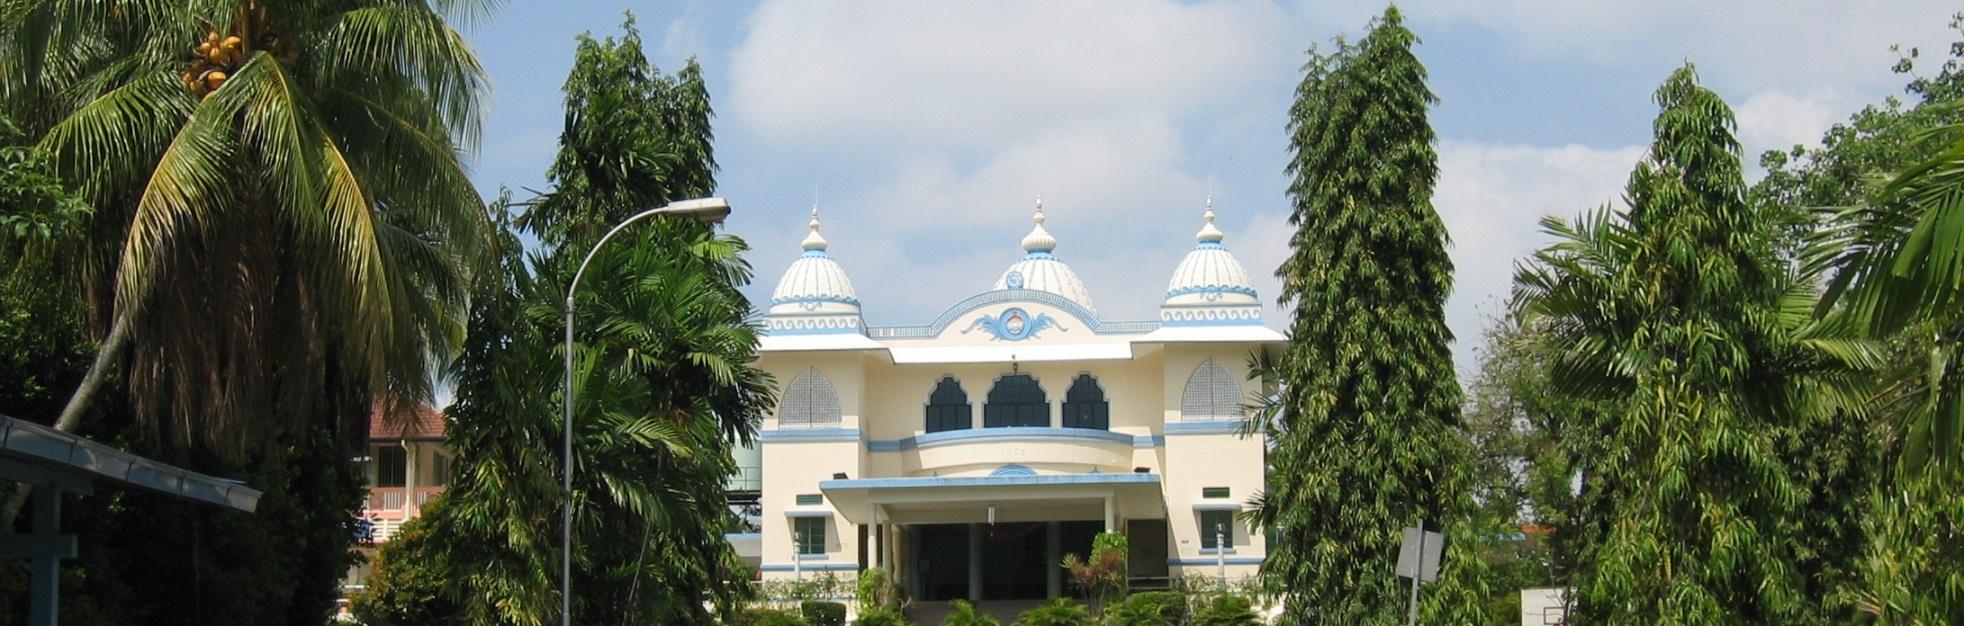 The temple at Ramakrishna Mission. Photo courtesy: ramakrishna.org.sg